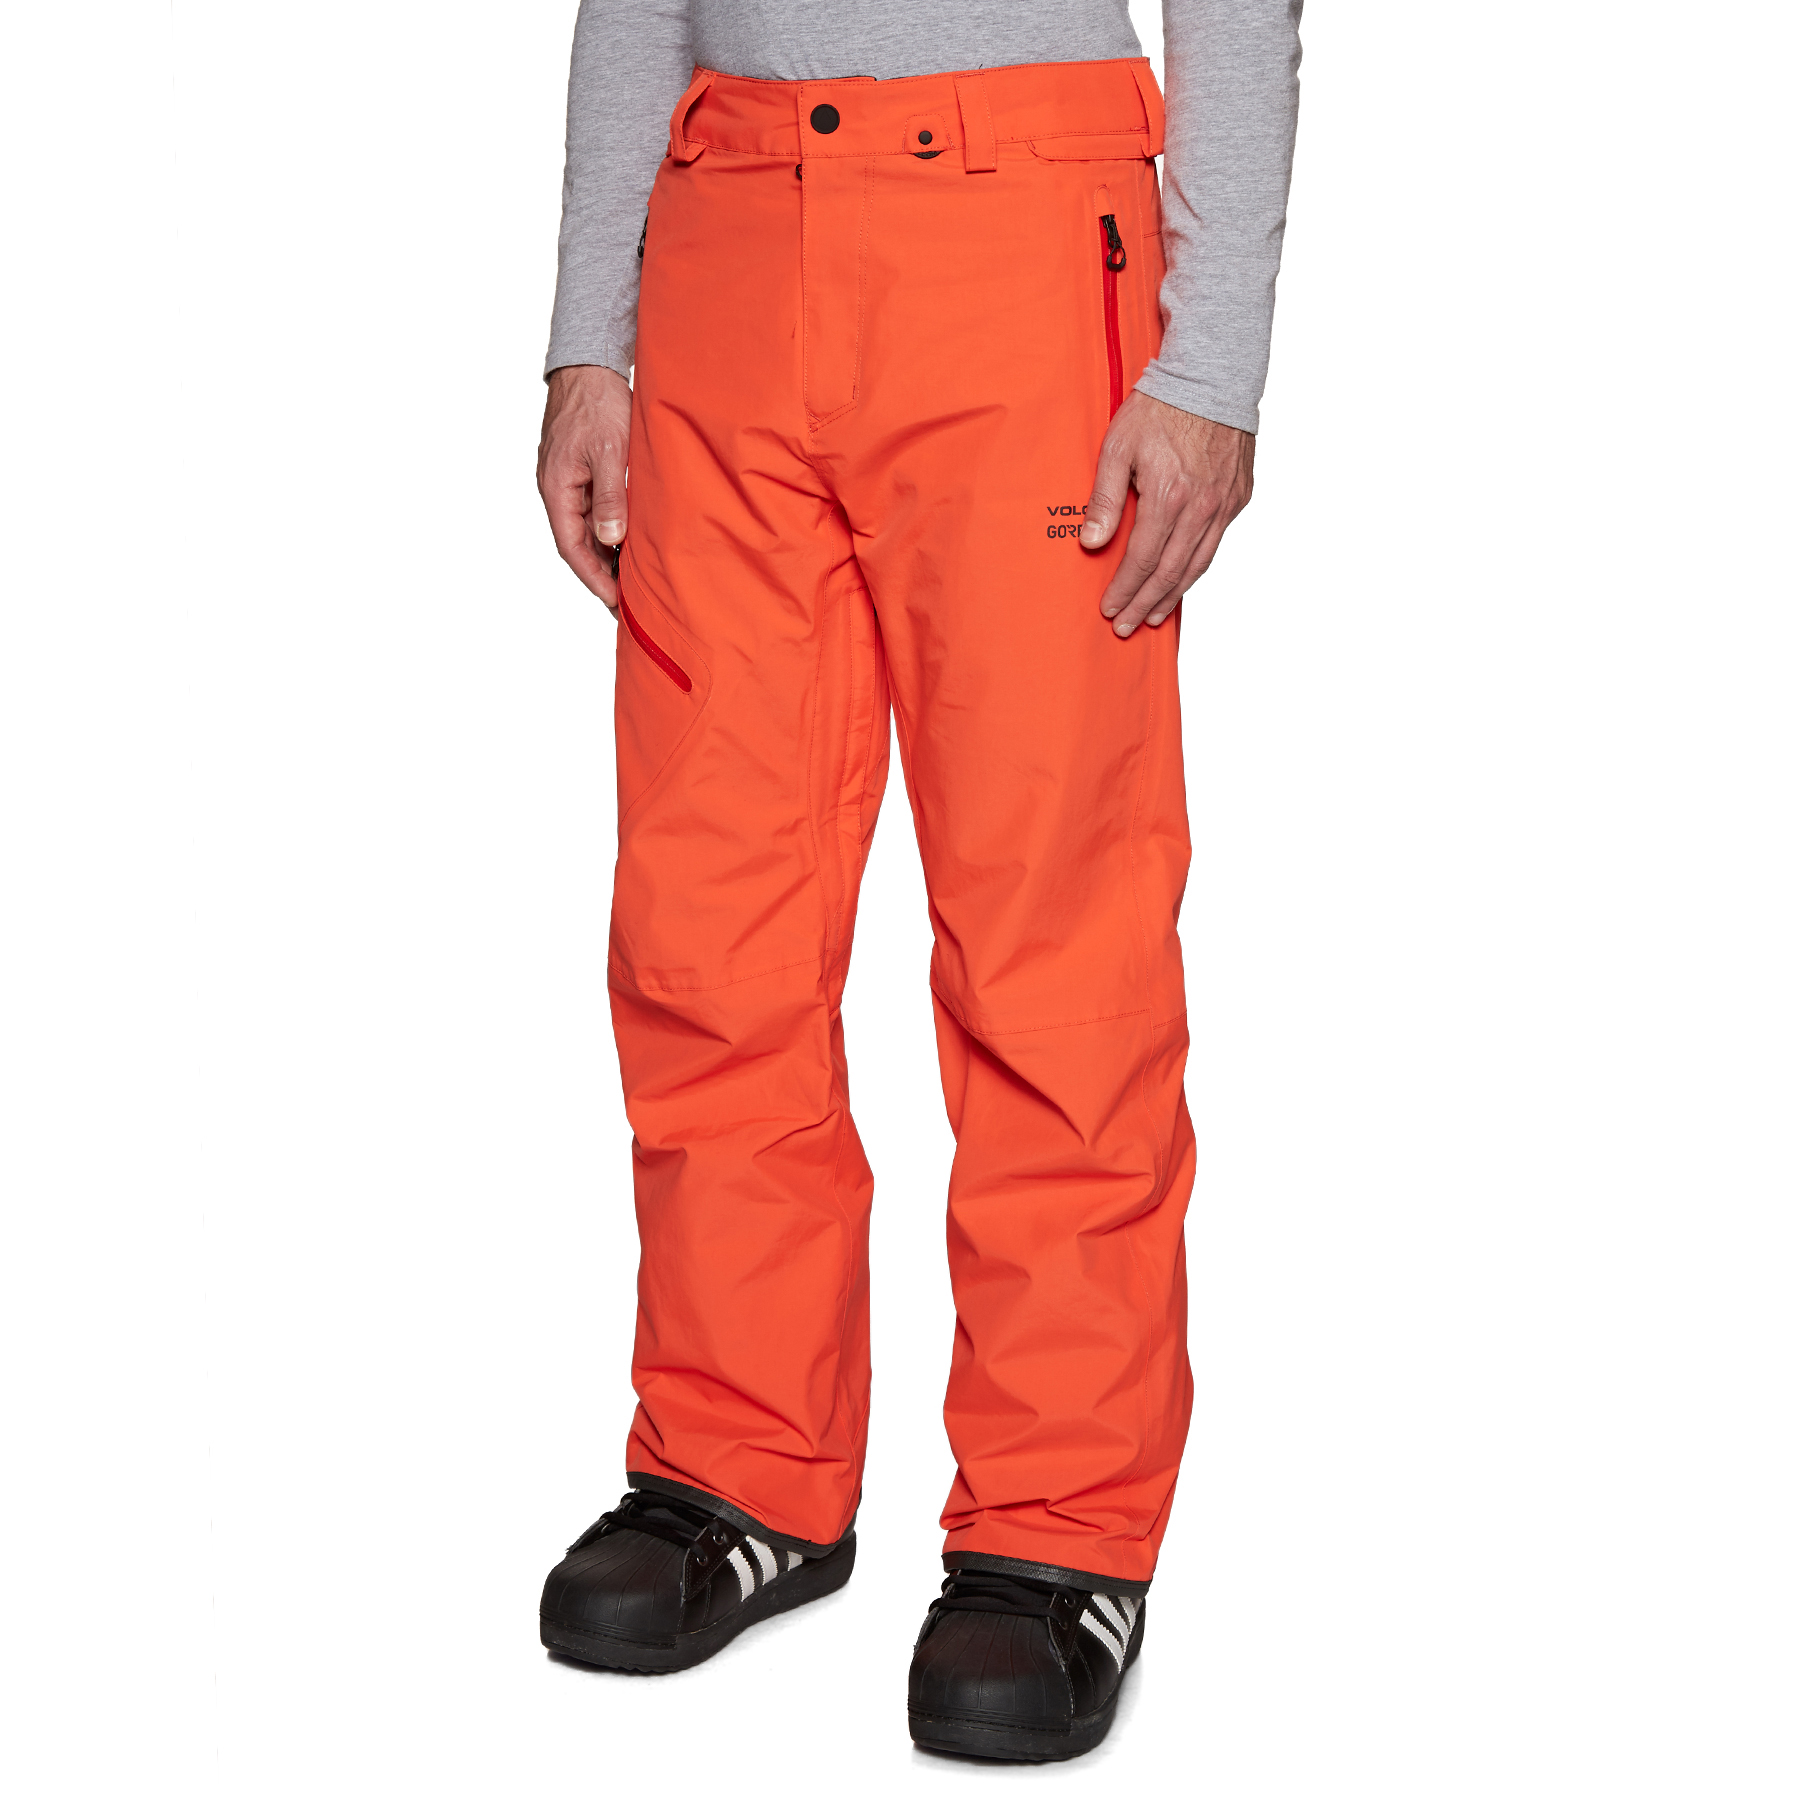 Advertisement(eBay) Volcom Ski Snowboard Pants Womens L